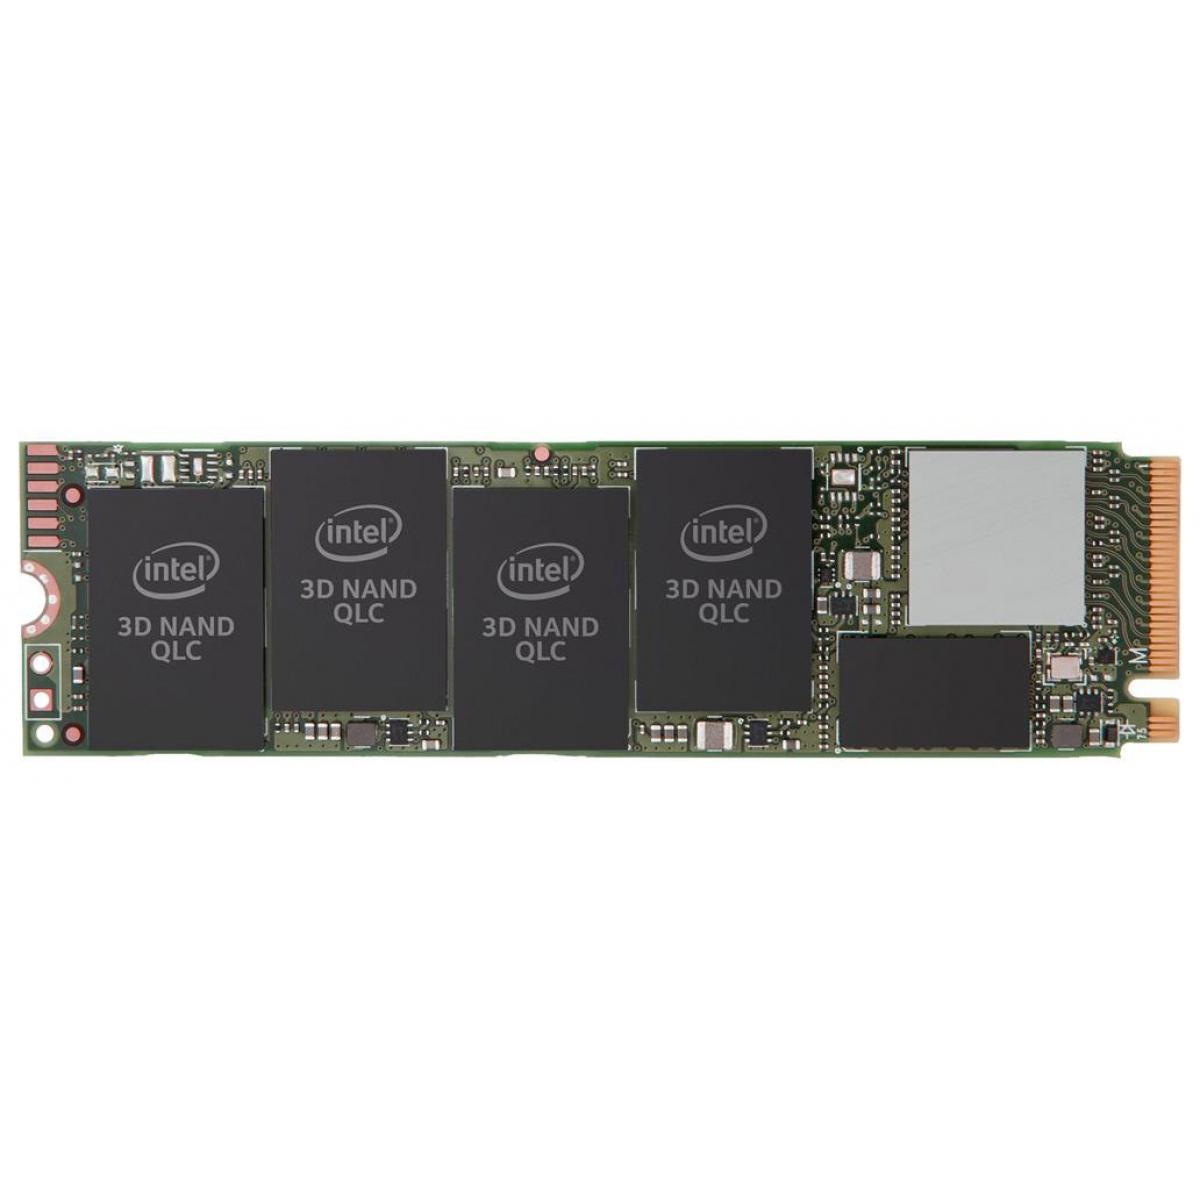 SSD Intel 660p, 512GB, M.2 2280, NVMe, Leitura 1500MBs e Gravação 1000MBs, SSDPEKNW512G8X1